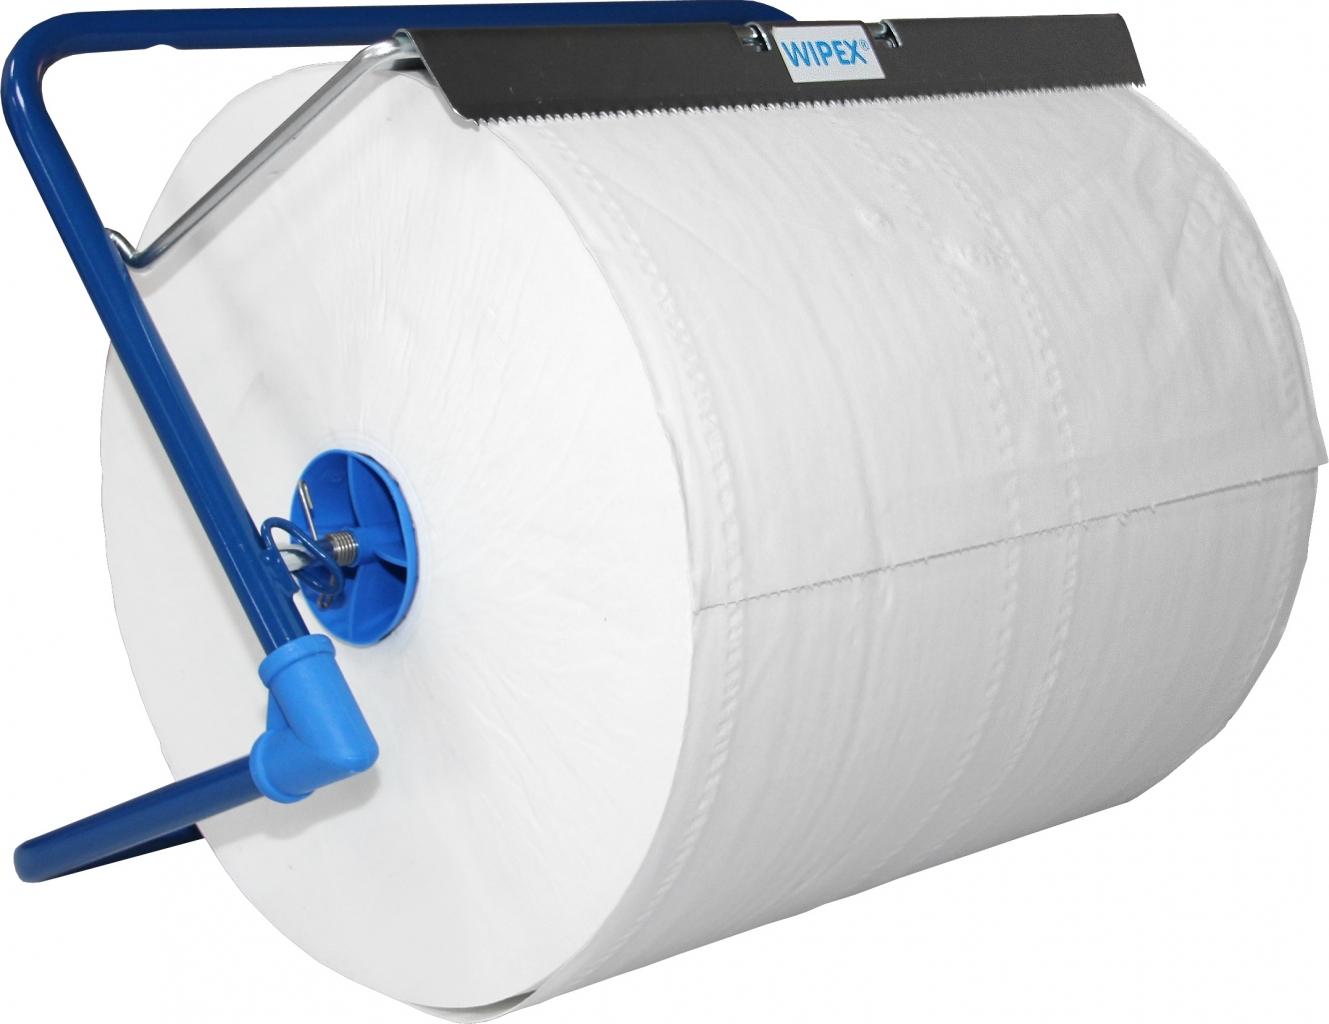 Stěnový držák (stojan) papíru Nordvlies modrý 91560N, šíře 40 cm, fotografie 1/1